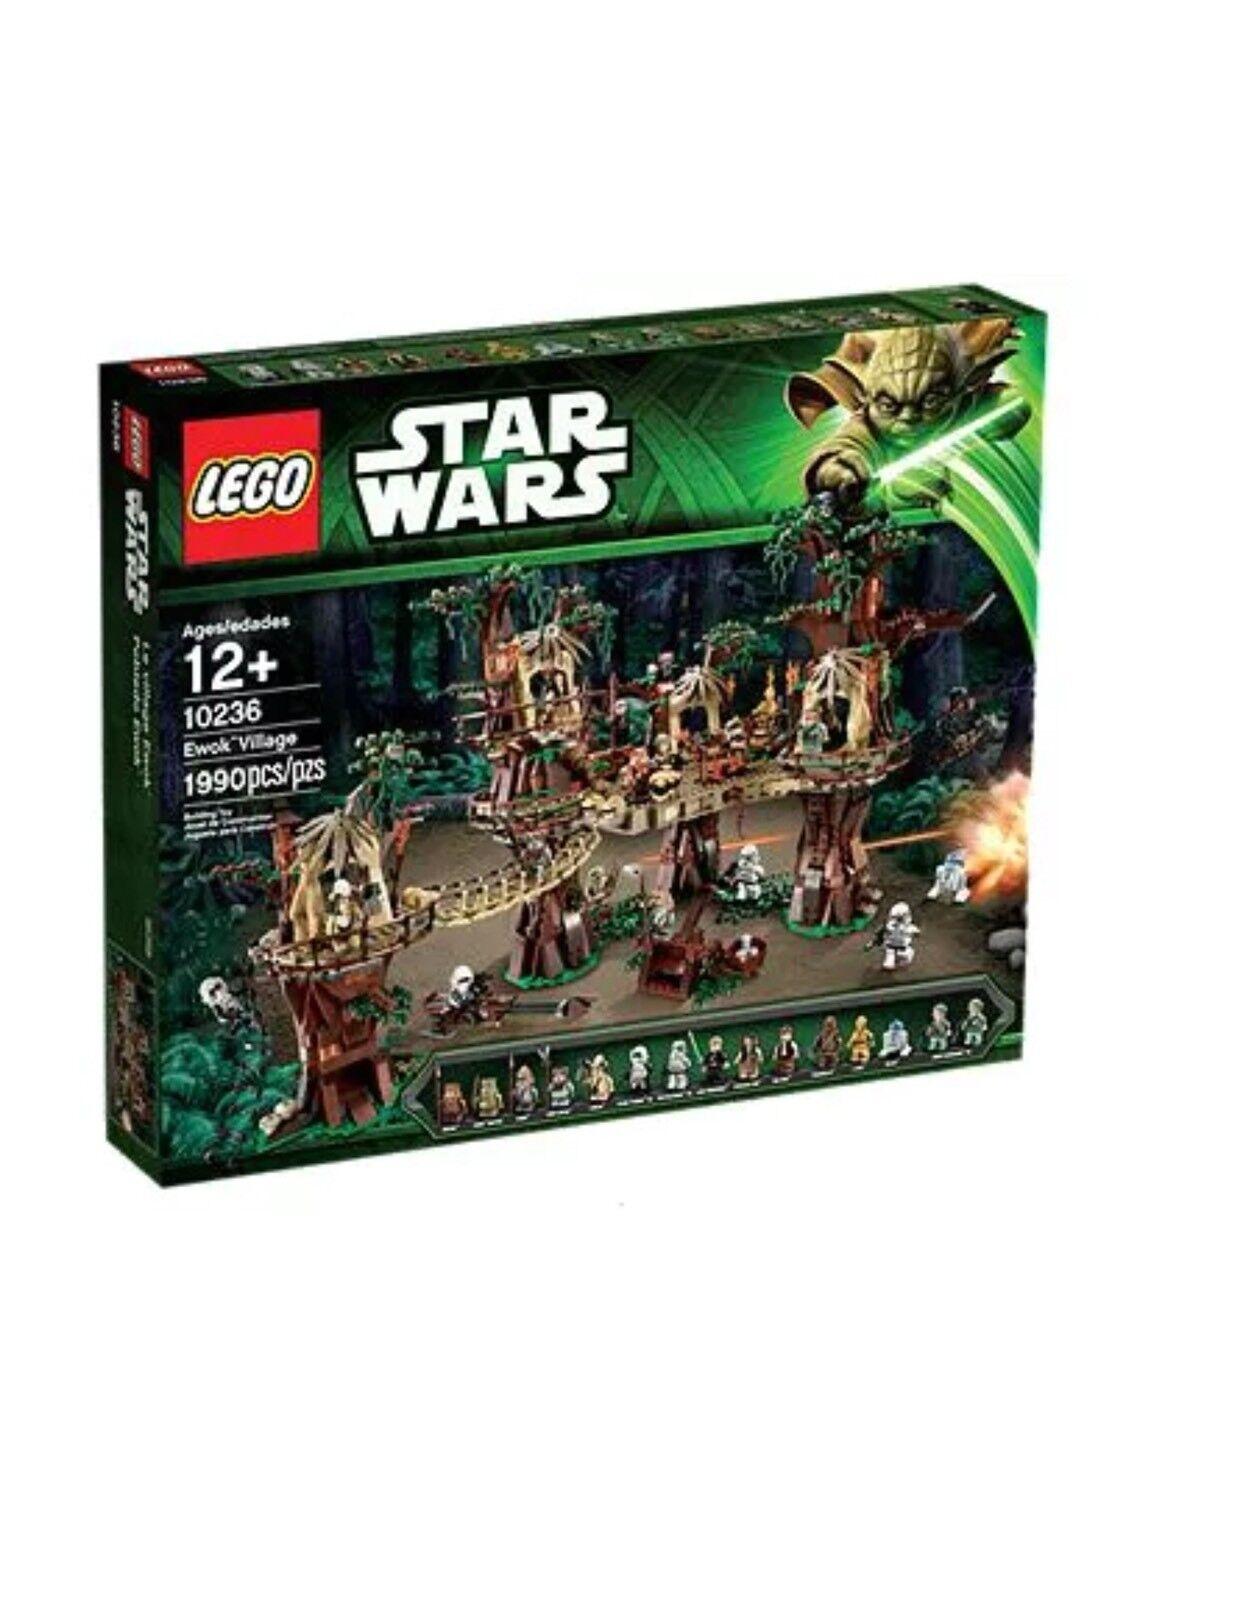 LEGO Star Wars 10236 Ewok Village New Sealed Retirot